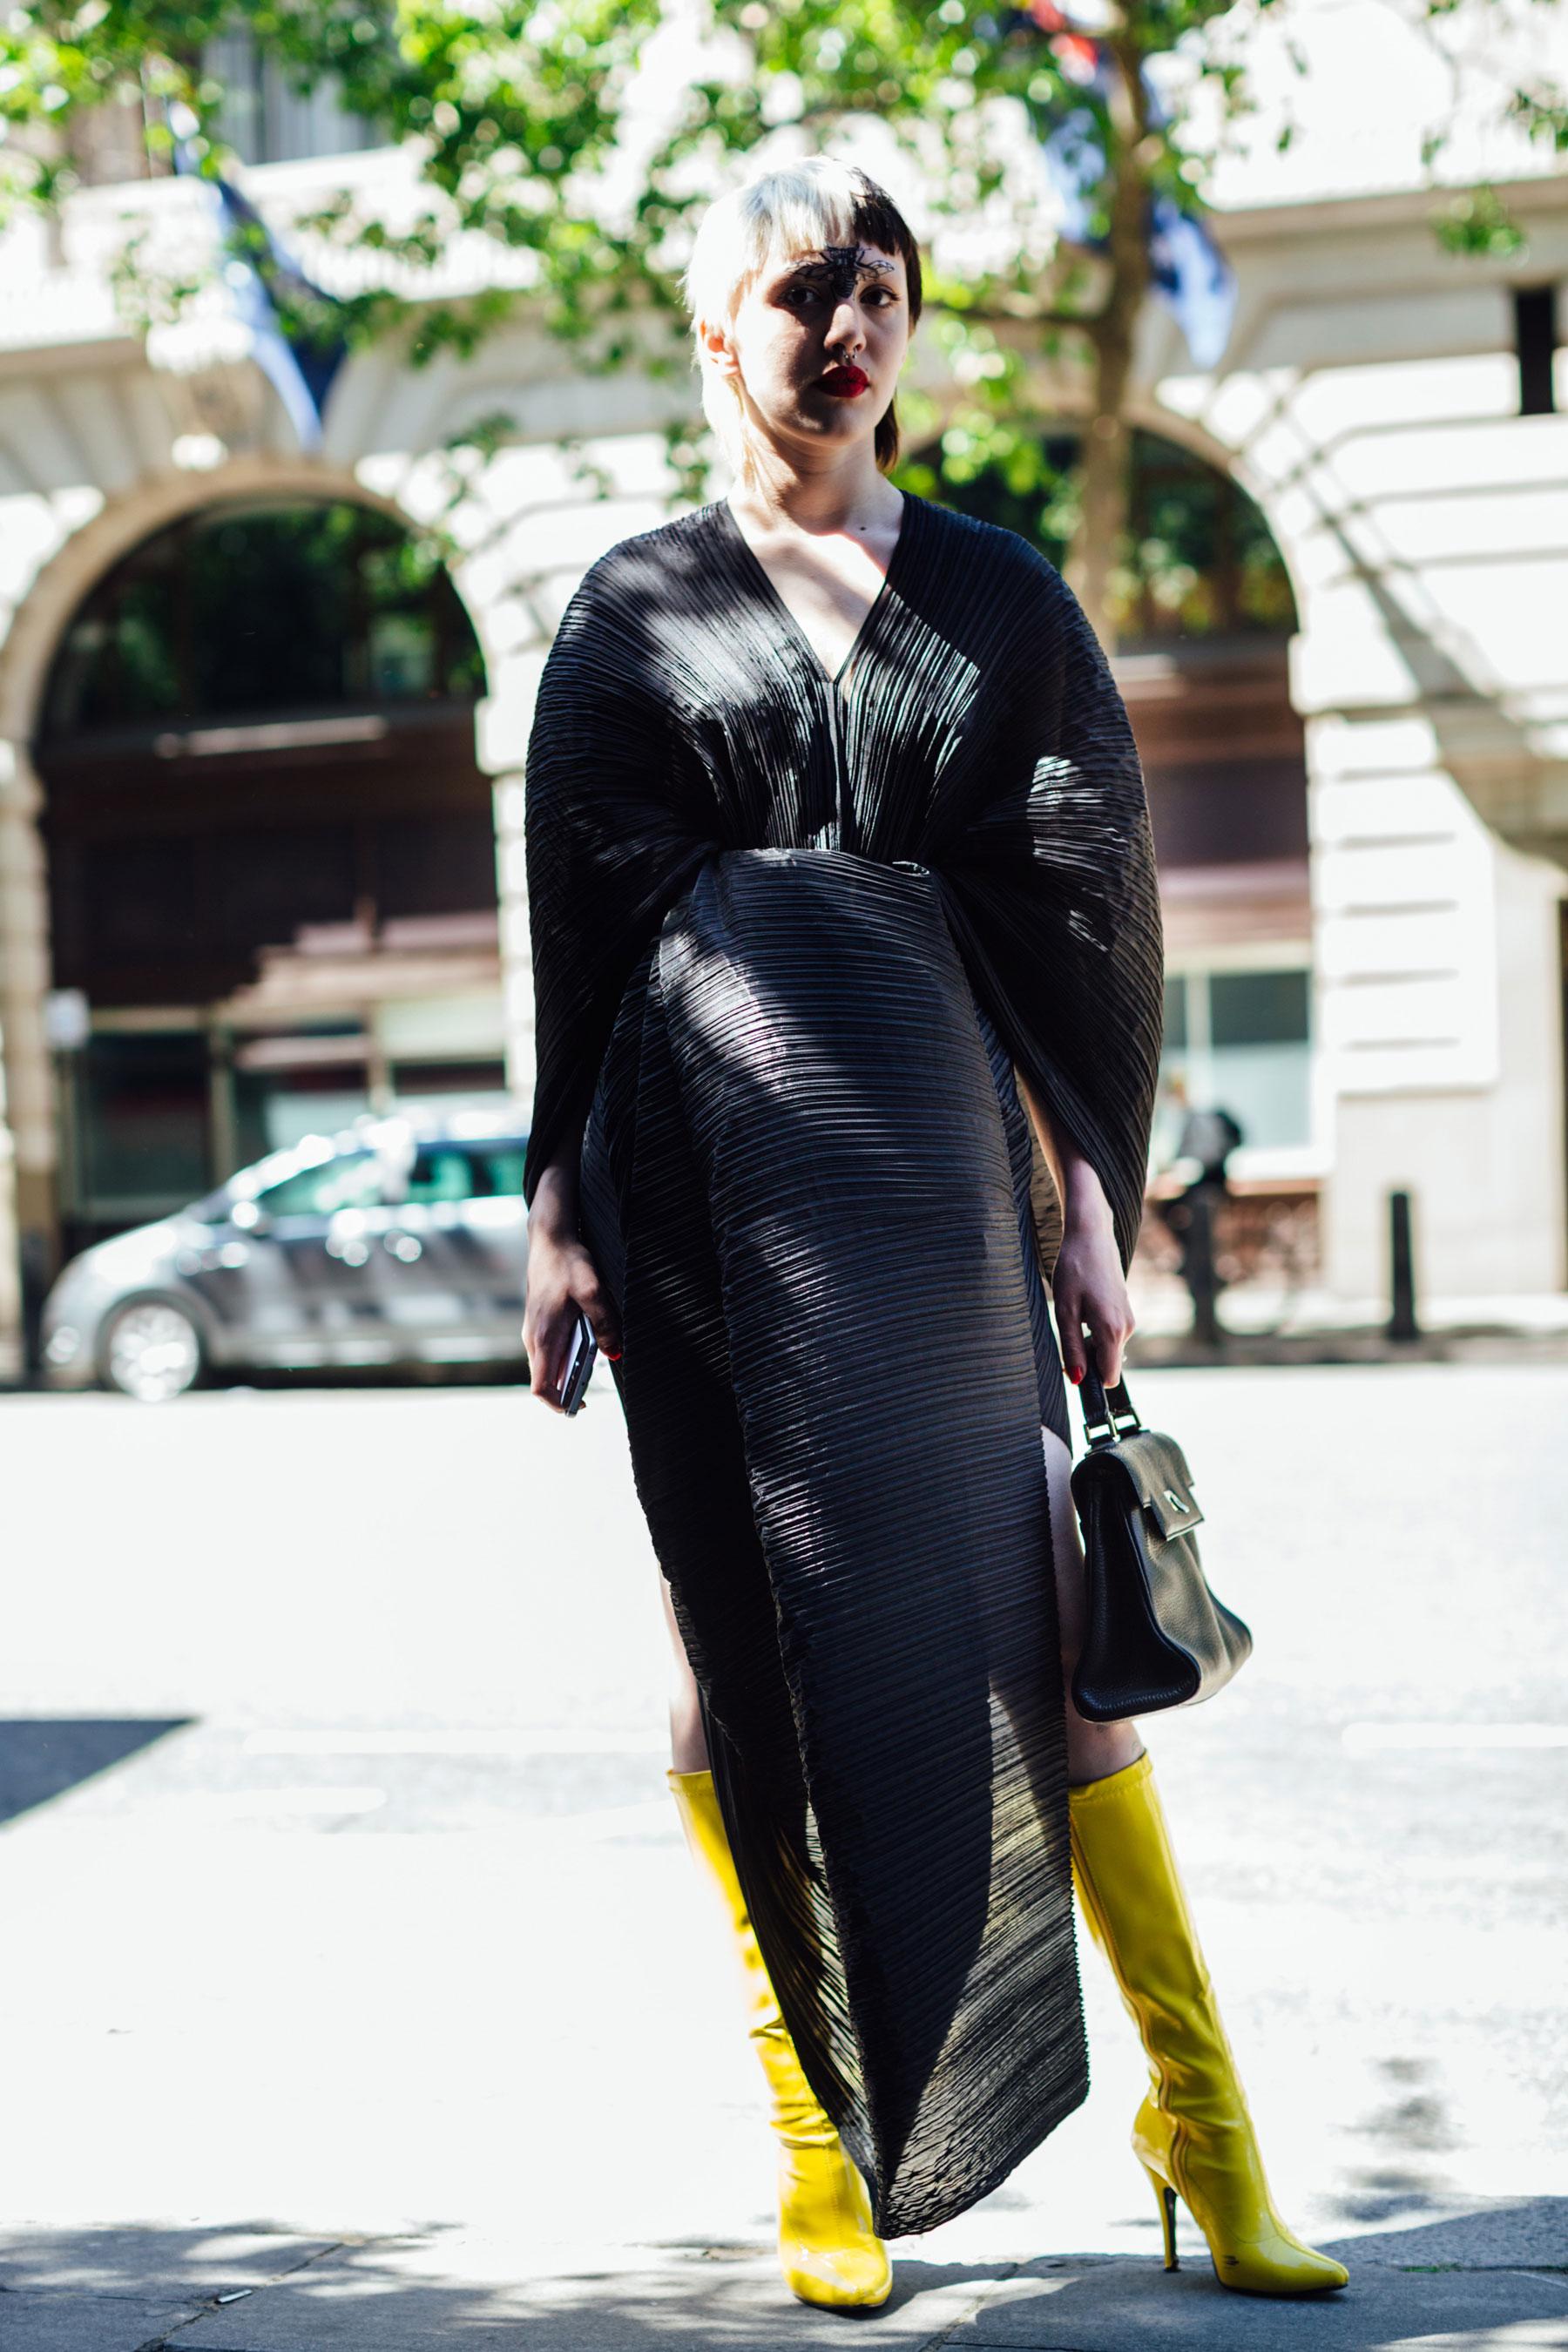 London Fashion Week Men's Street Style Spring 2018 Day 2